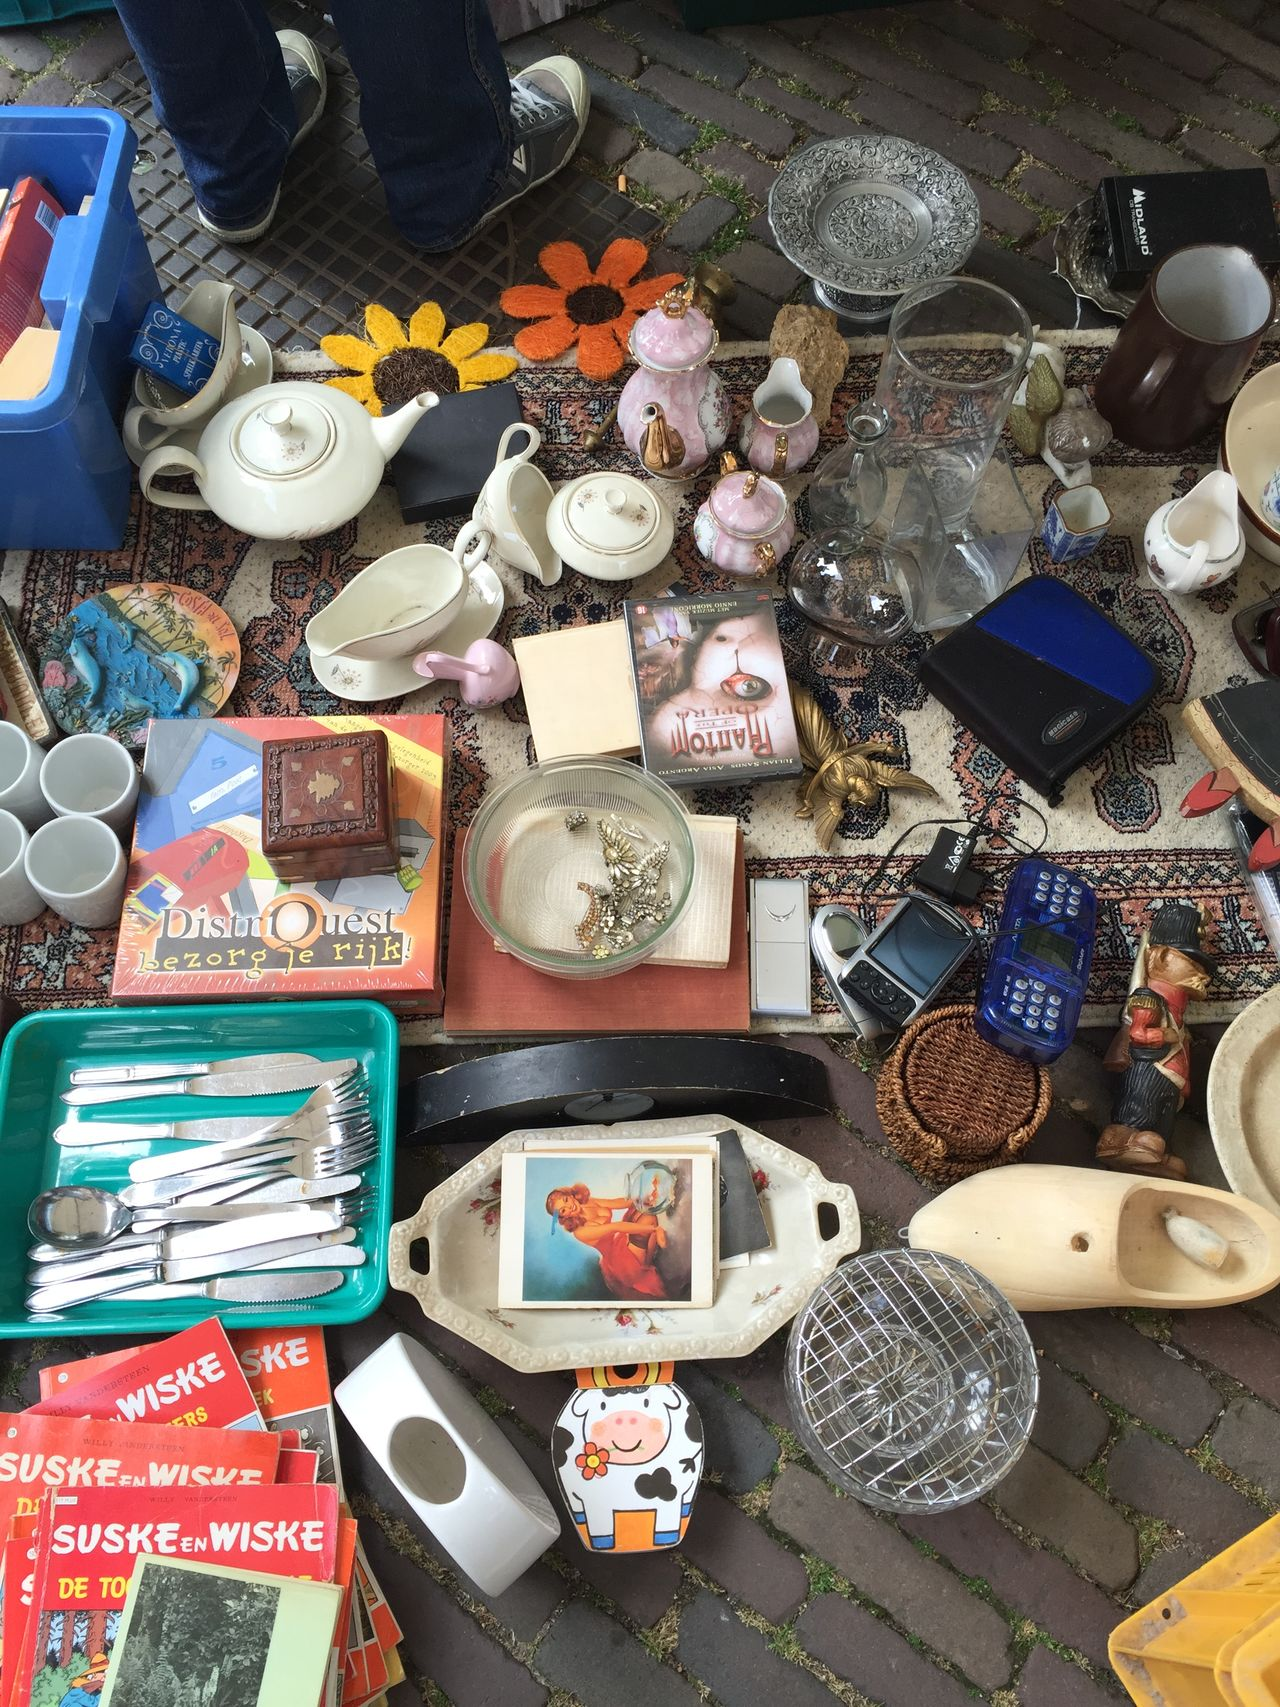 Another Man's Treasure at the Monday Market Jordaan Amsterdamcity Flea Market Fleamarketfinds